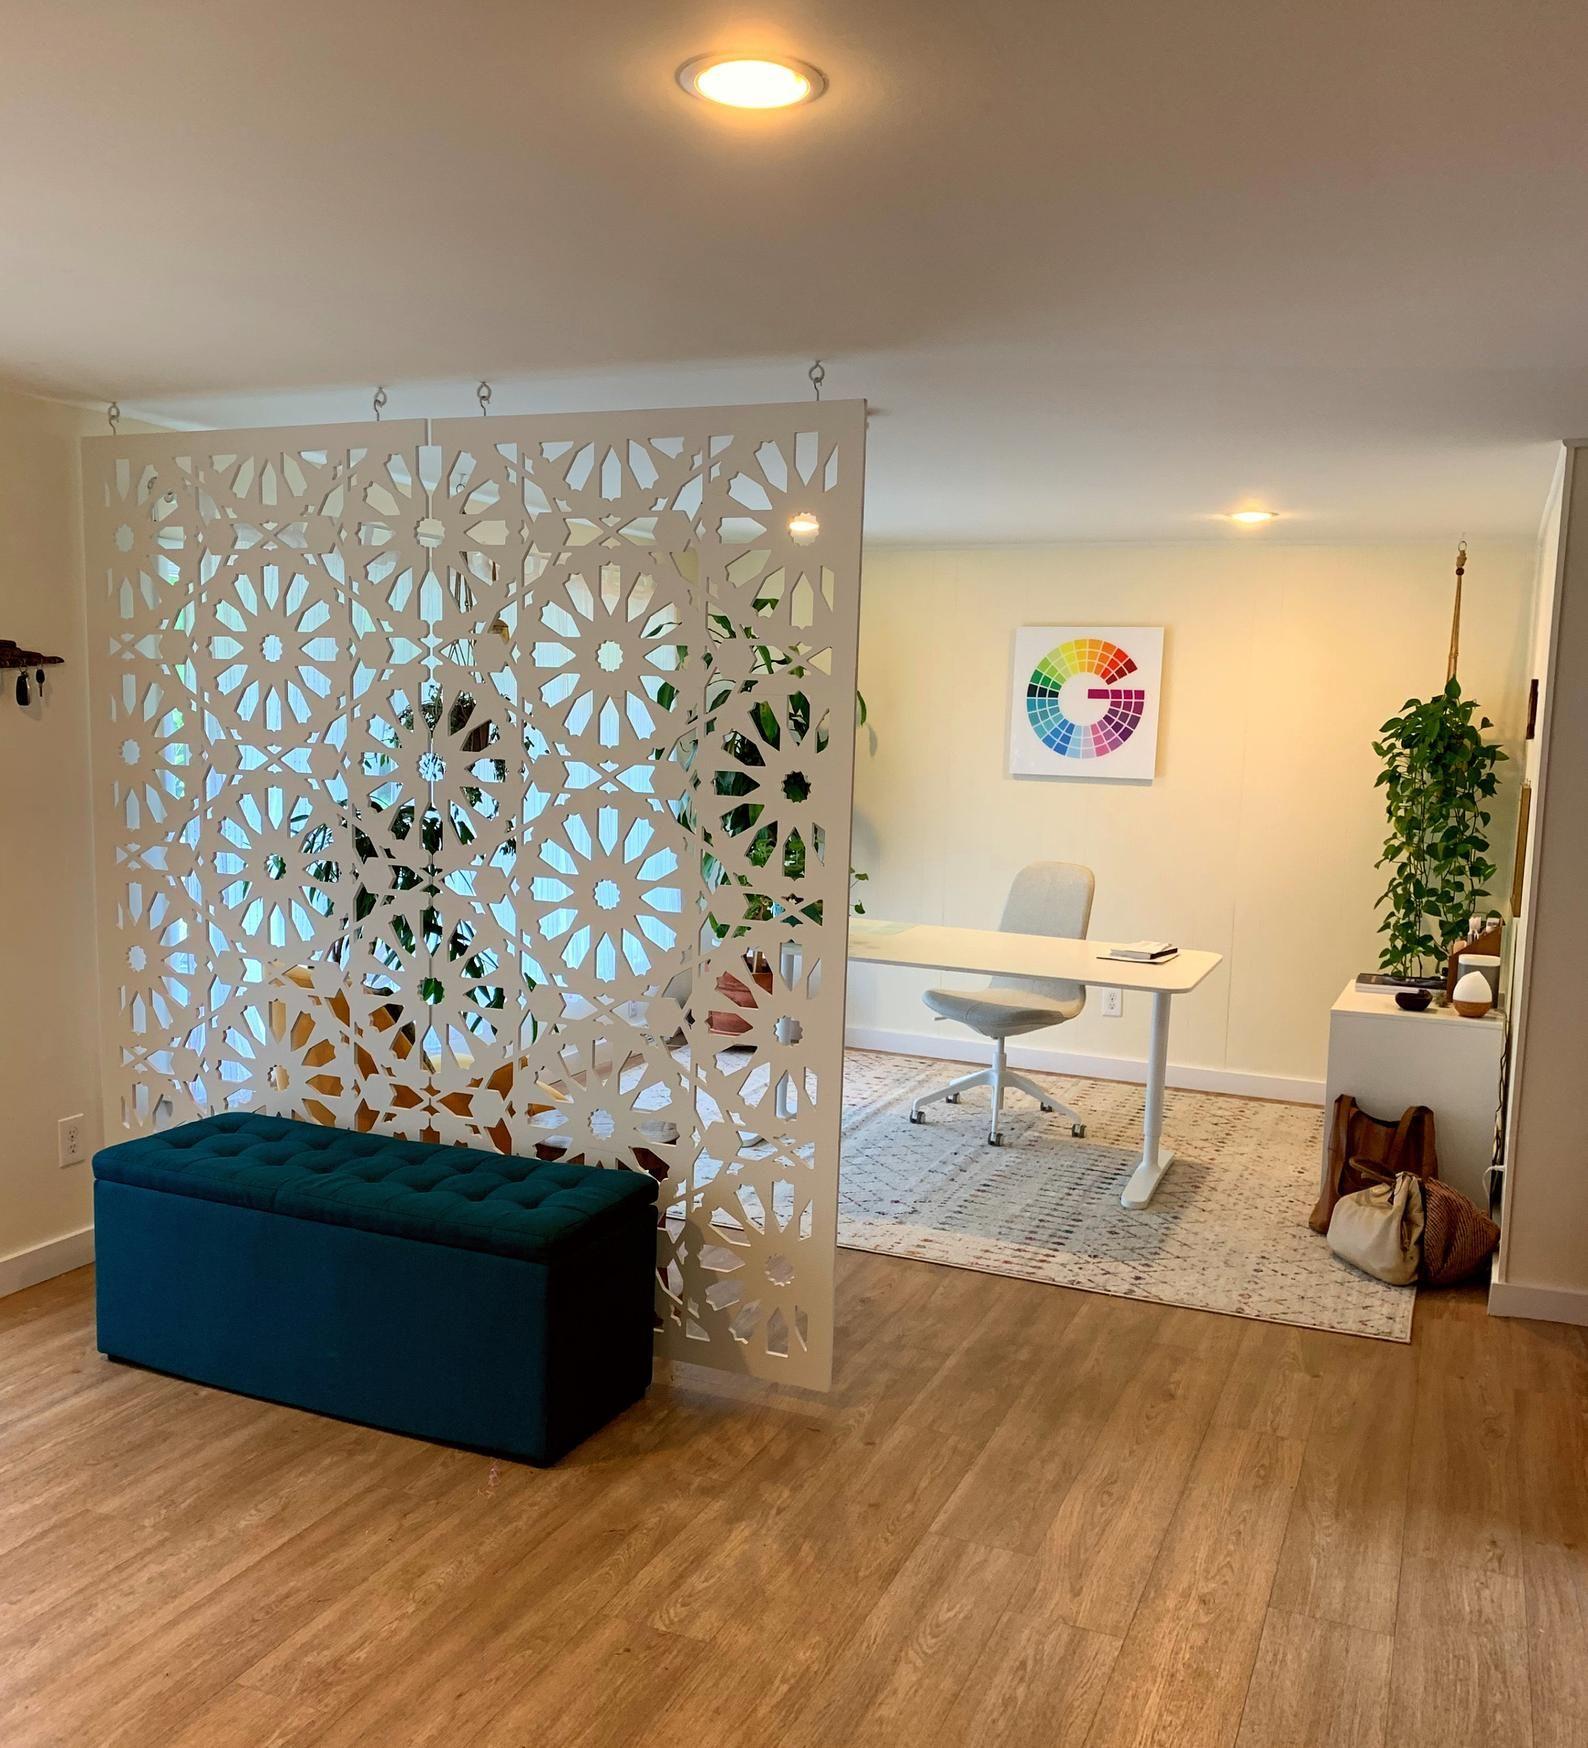 Room Divide Room Divider Custom Divider Screen Panels Etsy In 2021 Decorative Room Dividers Room Partition Designs Walls Room